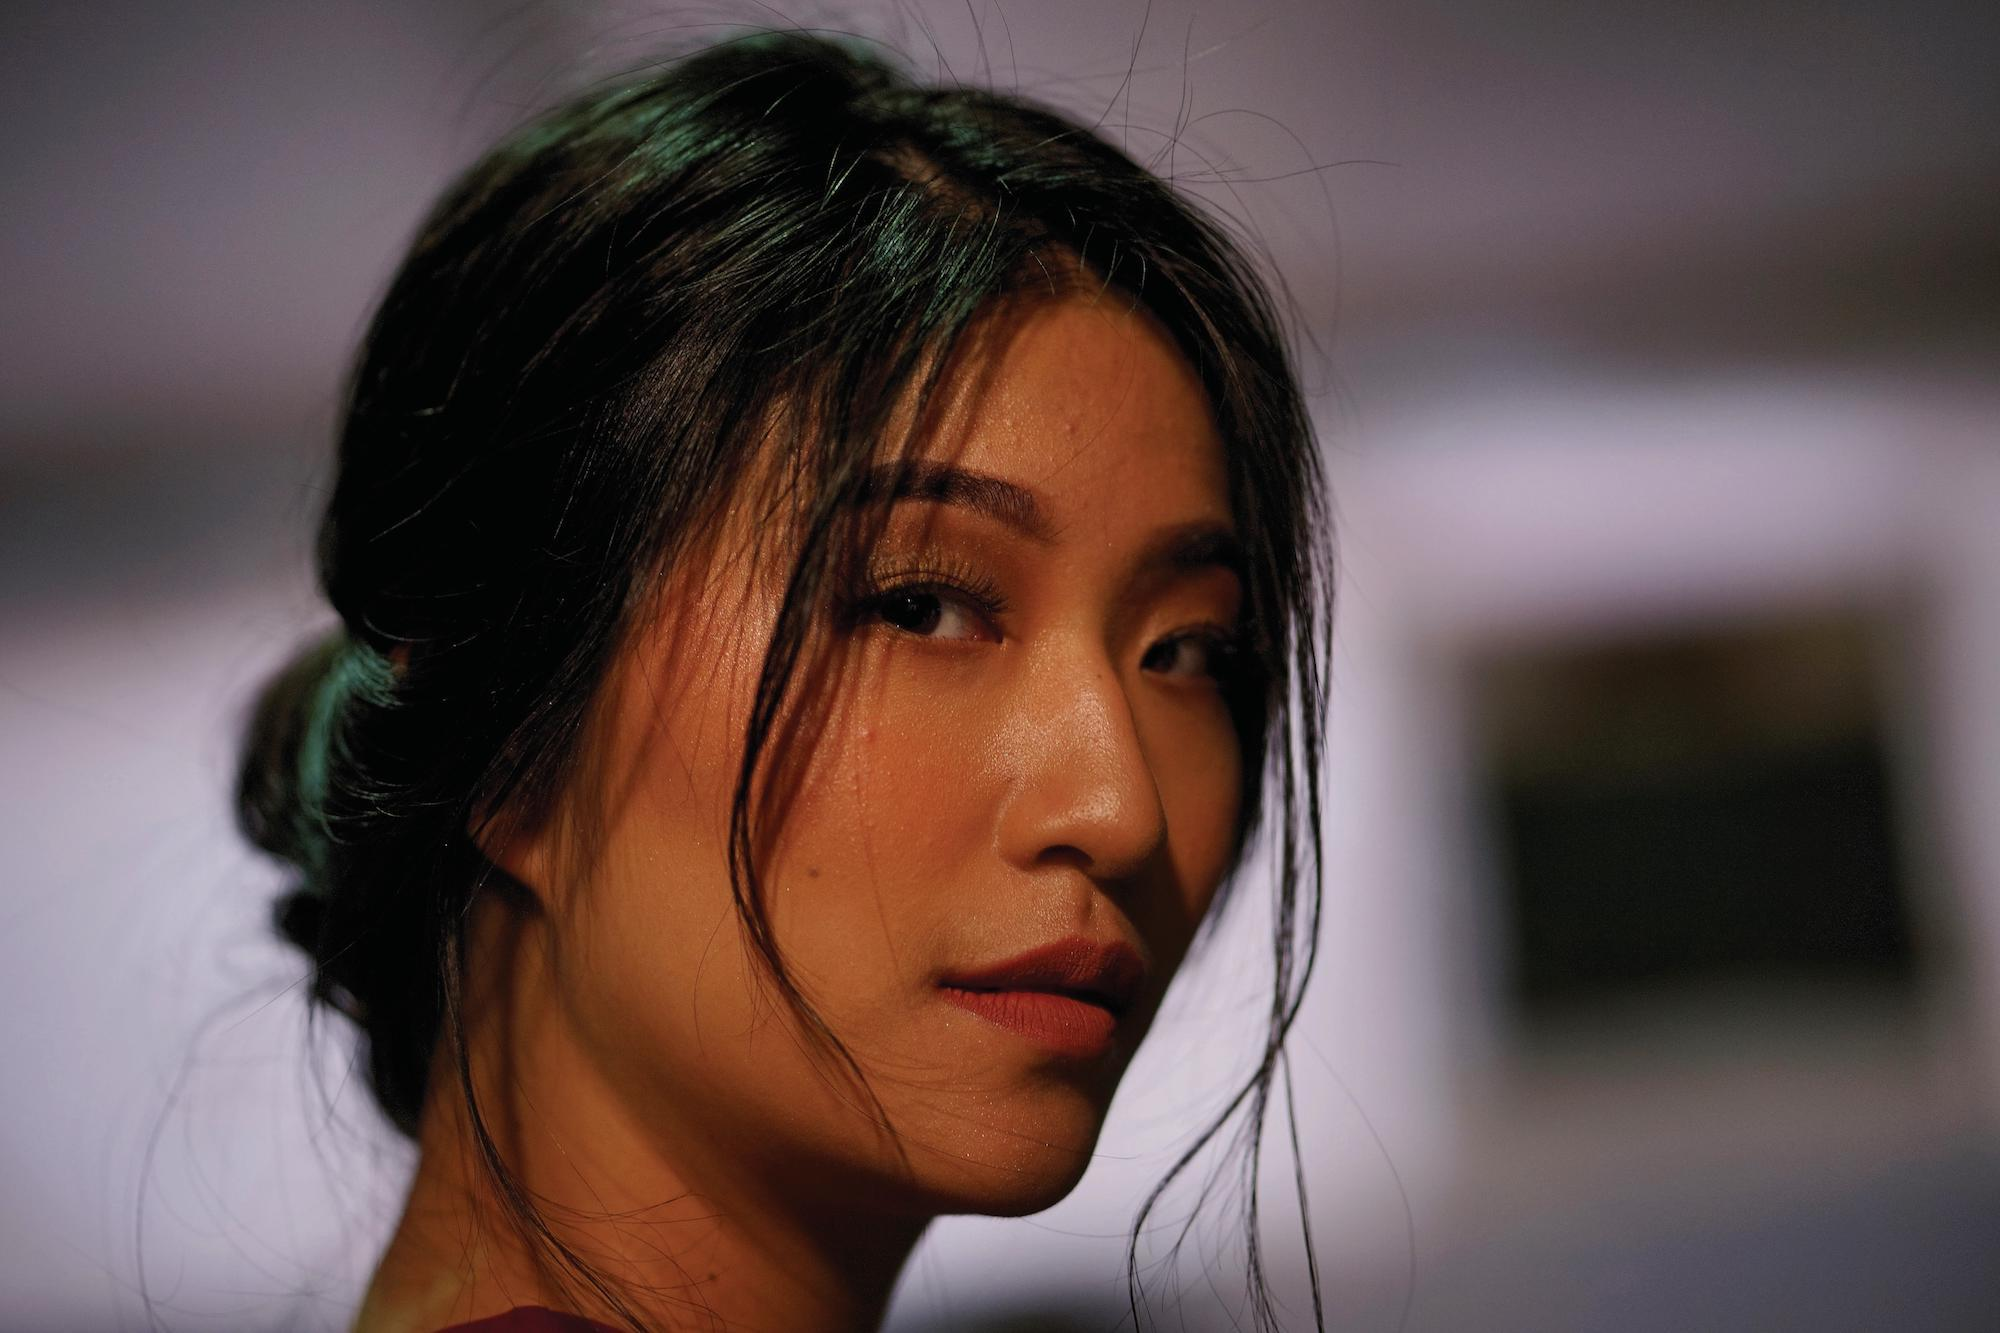 Wanita asia dengan model rambut messy bun pada warna rambut hitam Jakarta Fashion Week 2019